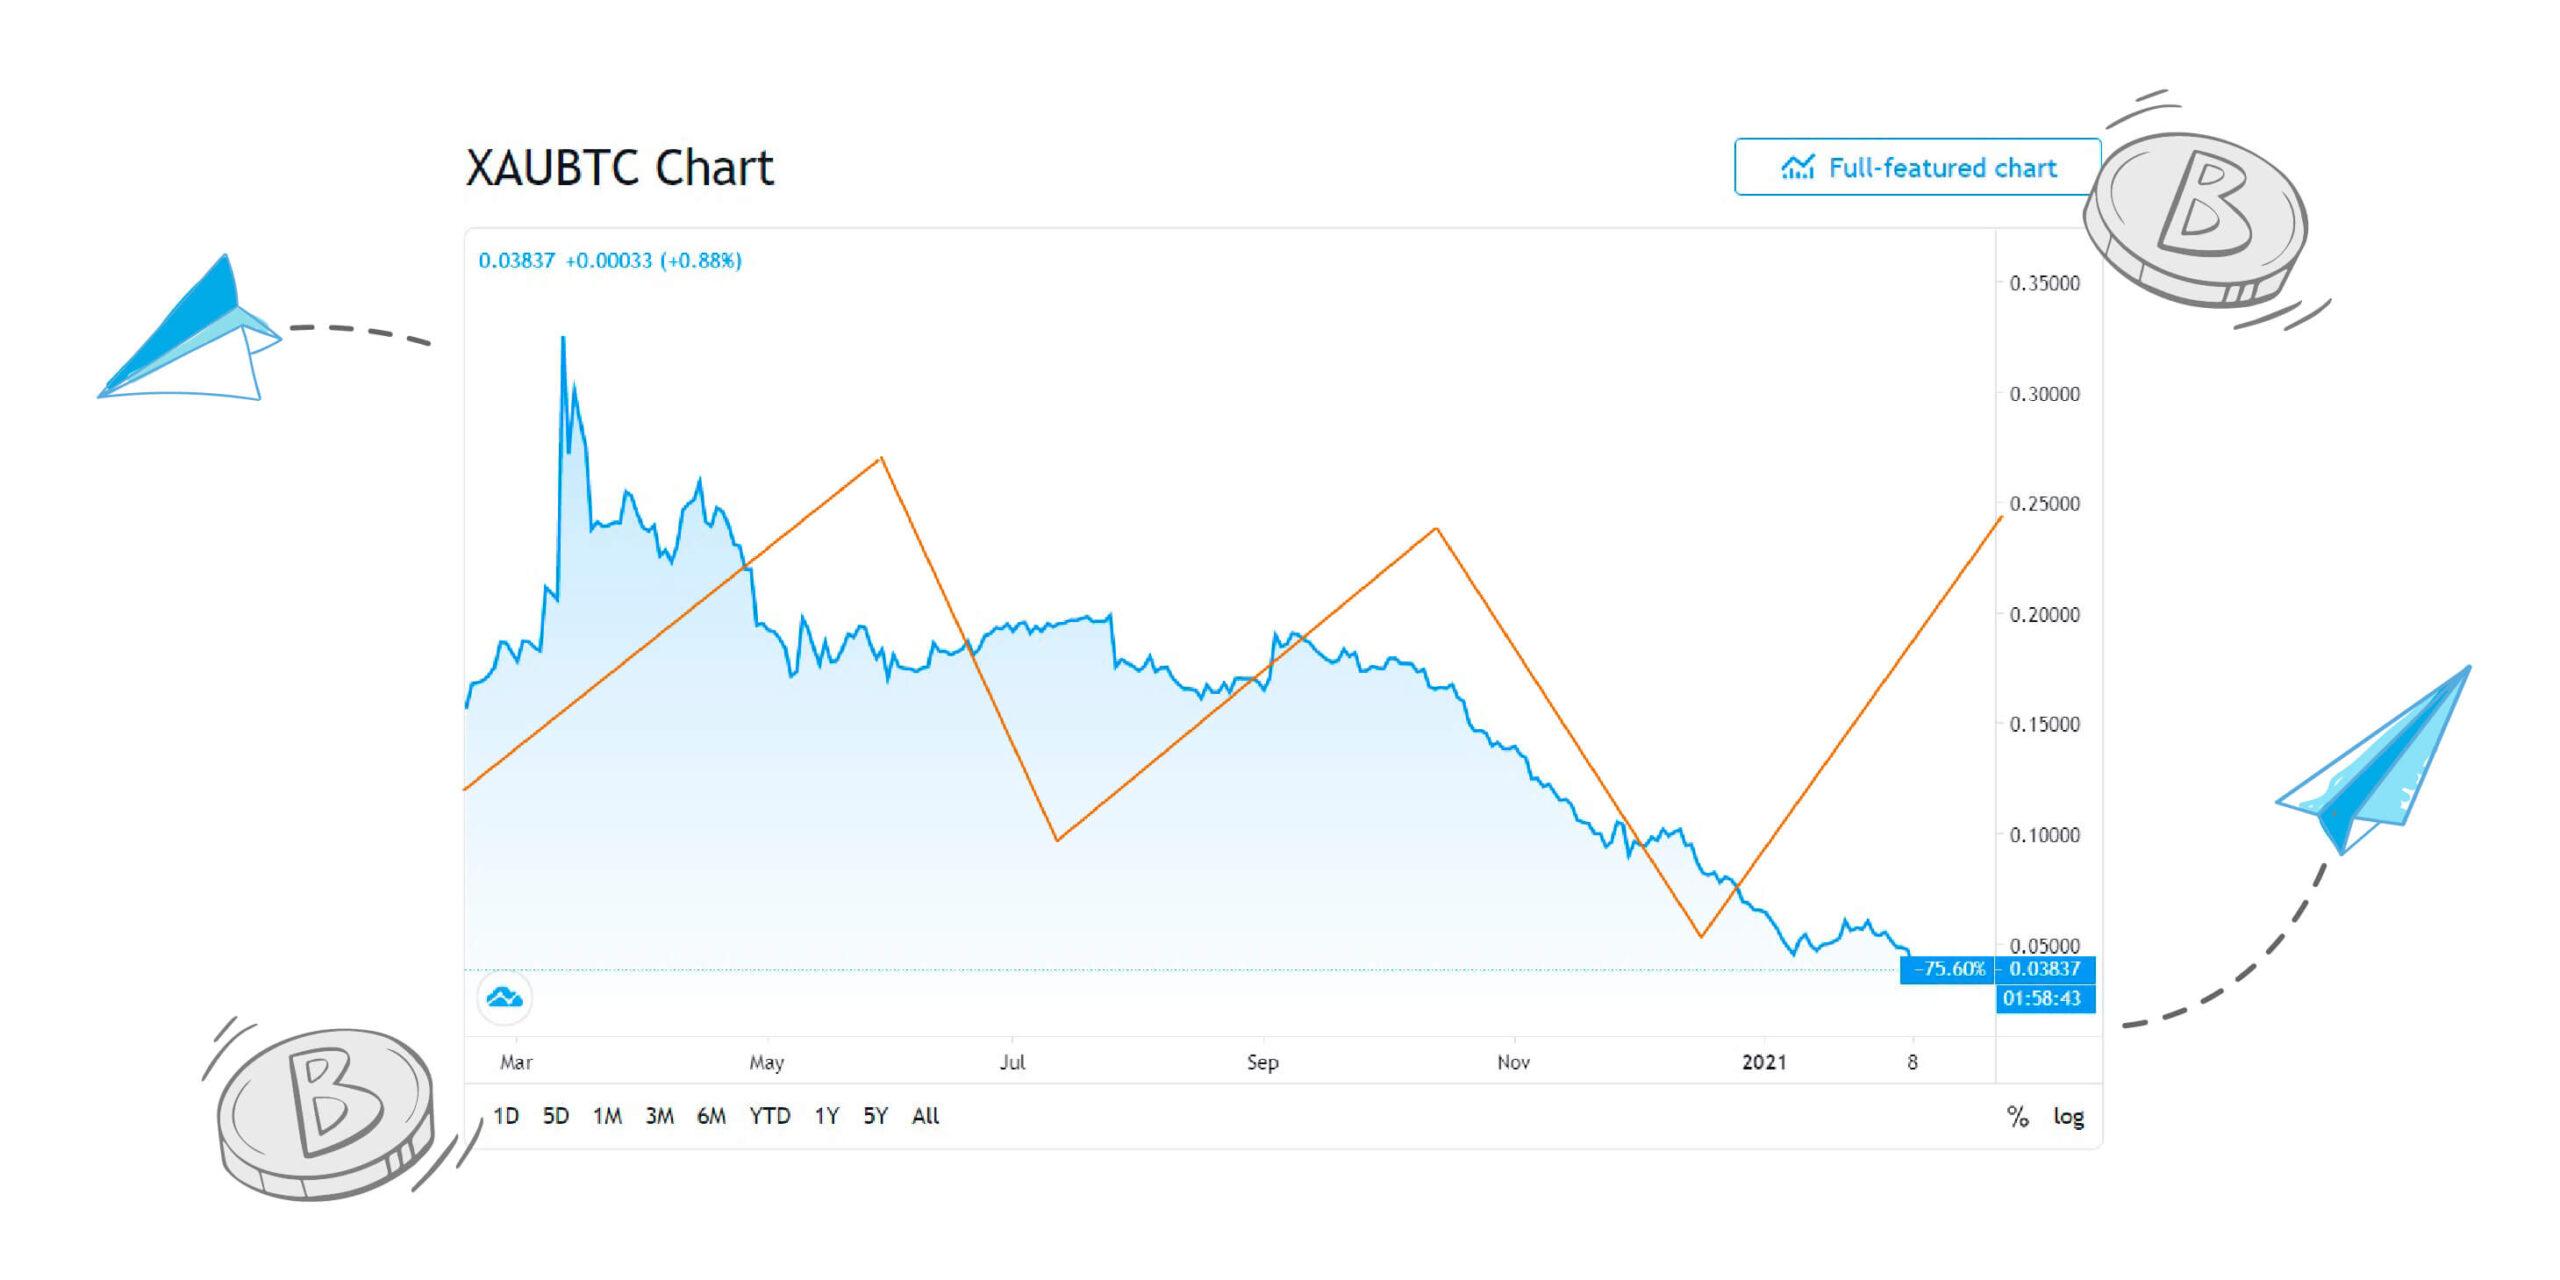 compra y venta de bitcoin Blog 09 bitcoin vs oro 01 3 scaled